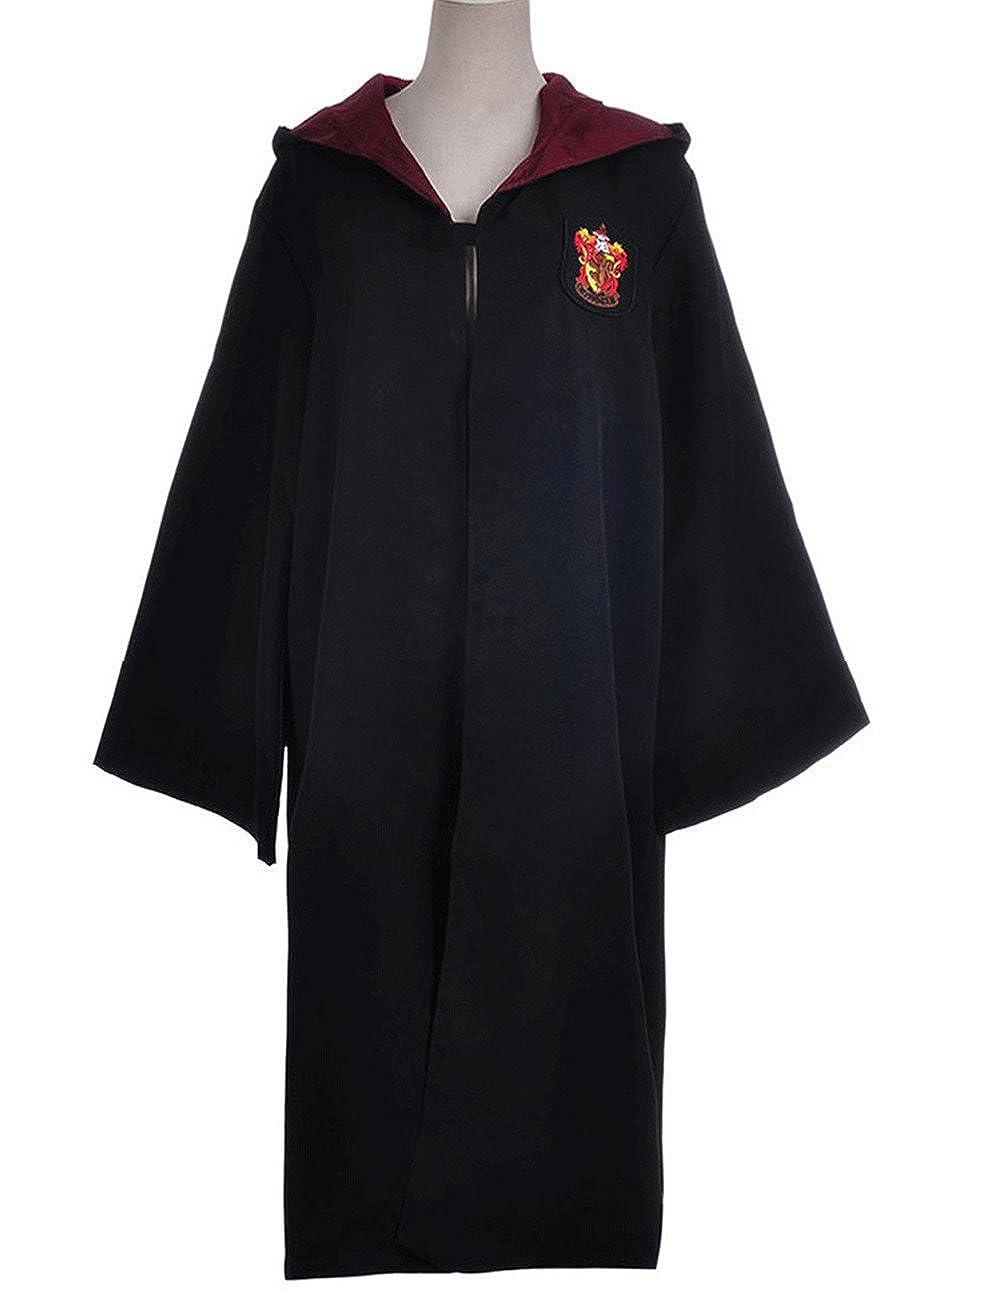 Harry Potter Kost/¨/¹m J/¨/¹nger Erwachsene Slytherin Schule lange Umhang Mantel Robe Gr??e S M XL